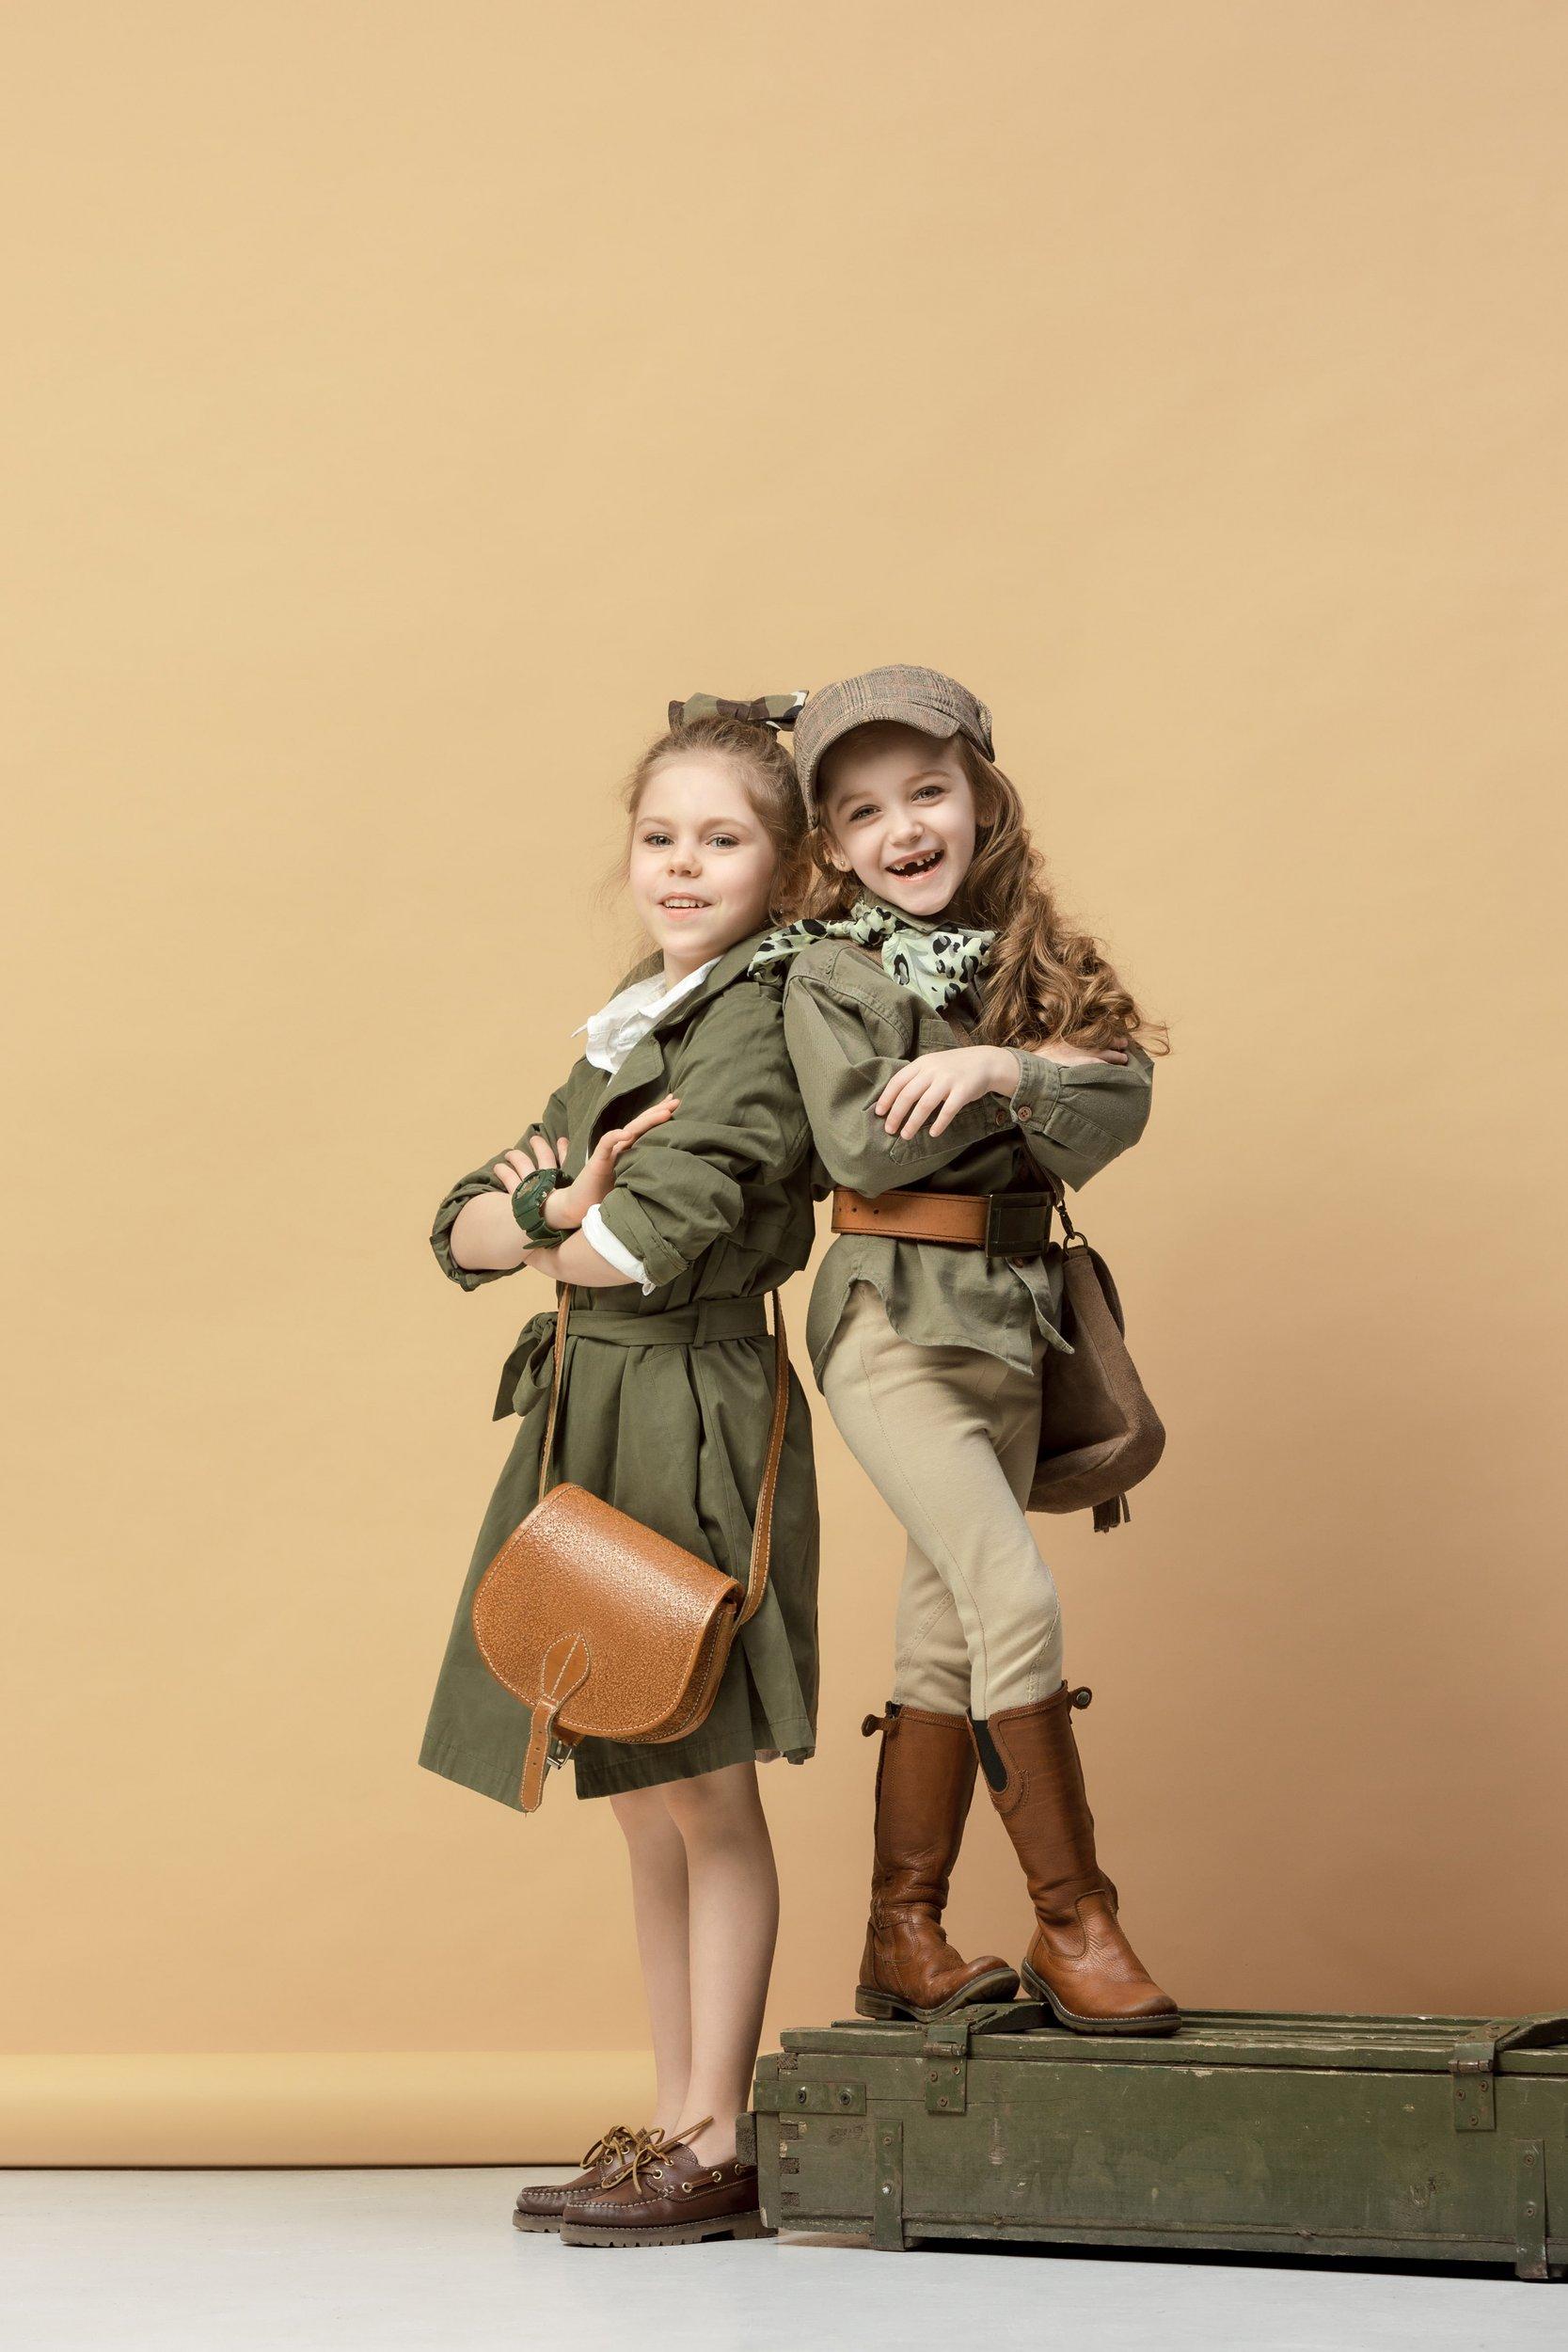 Kids presenting spring fashion